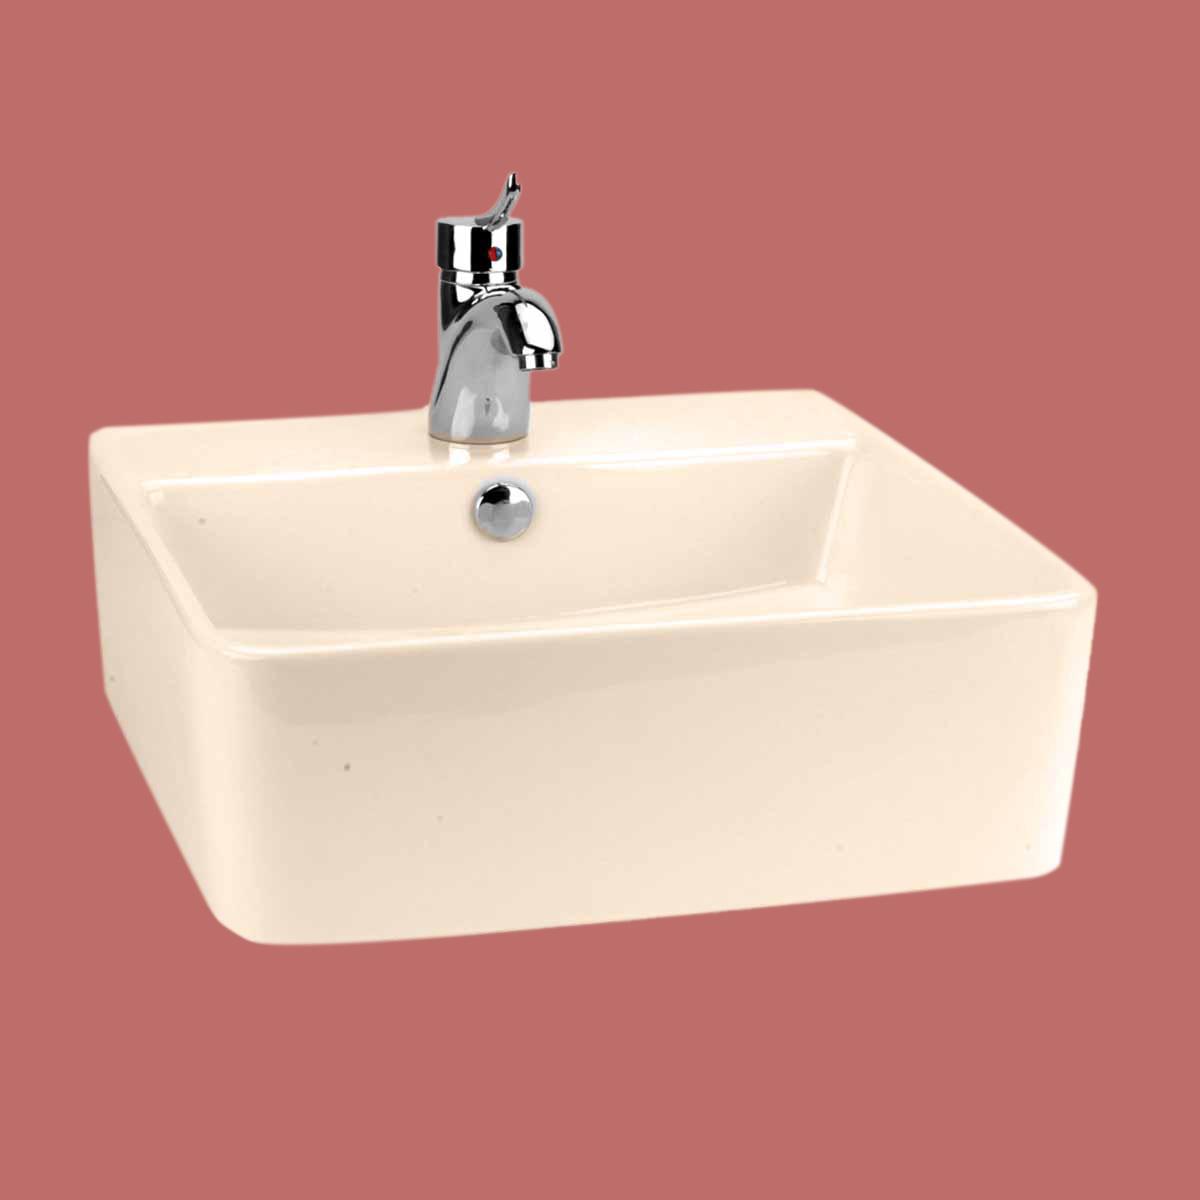 Square Bathroom Sinks : Bathroom Vessel Sink Square London Bone China